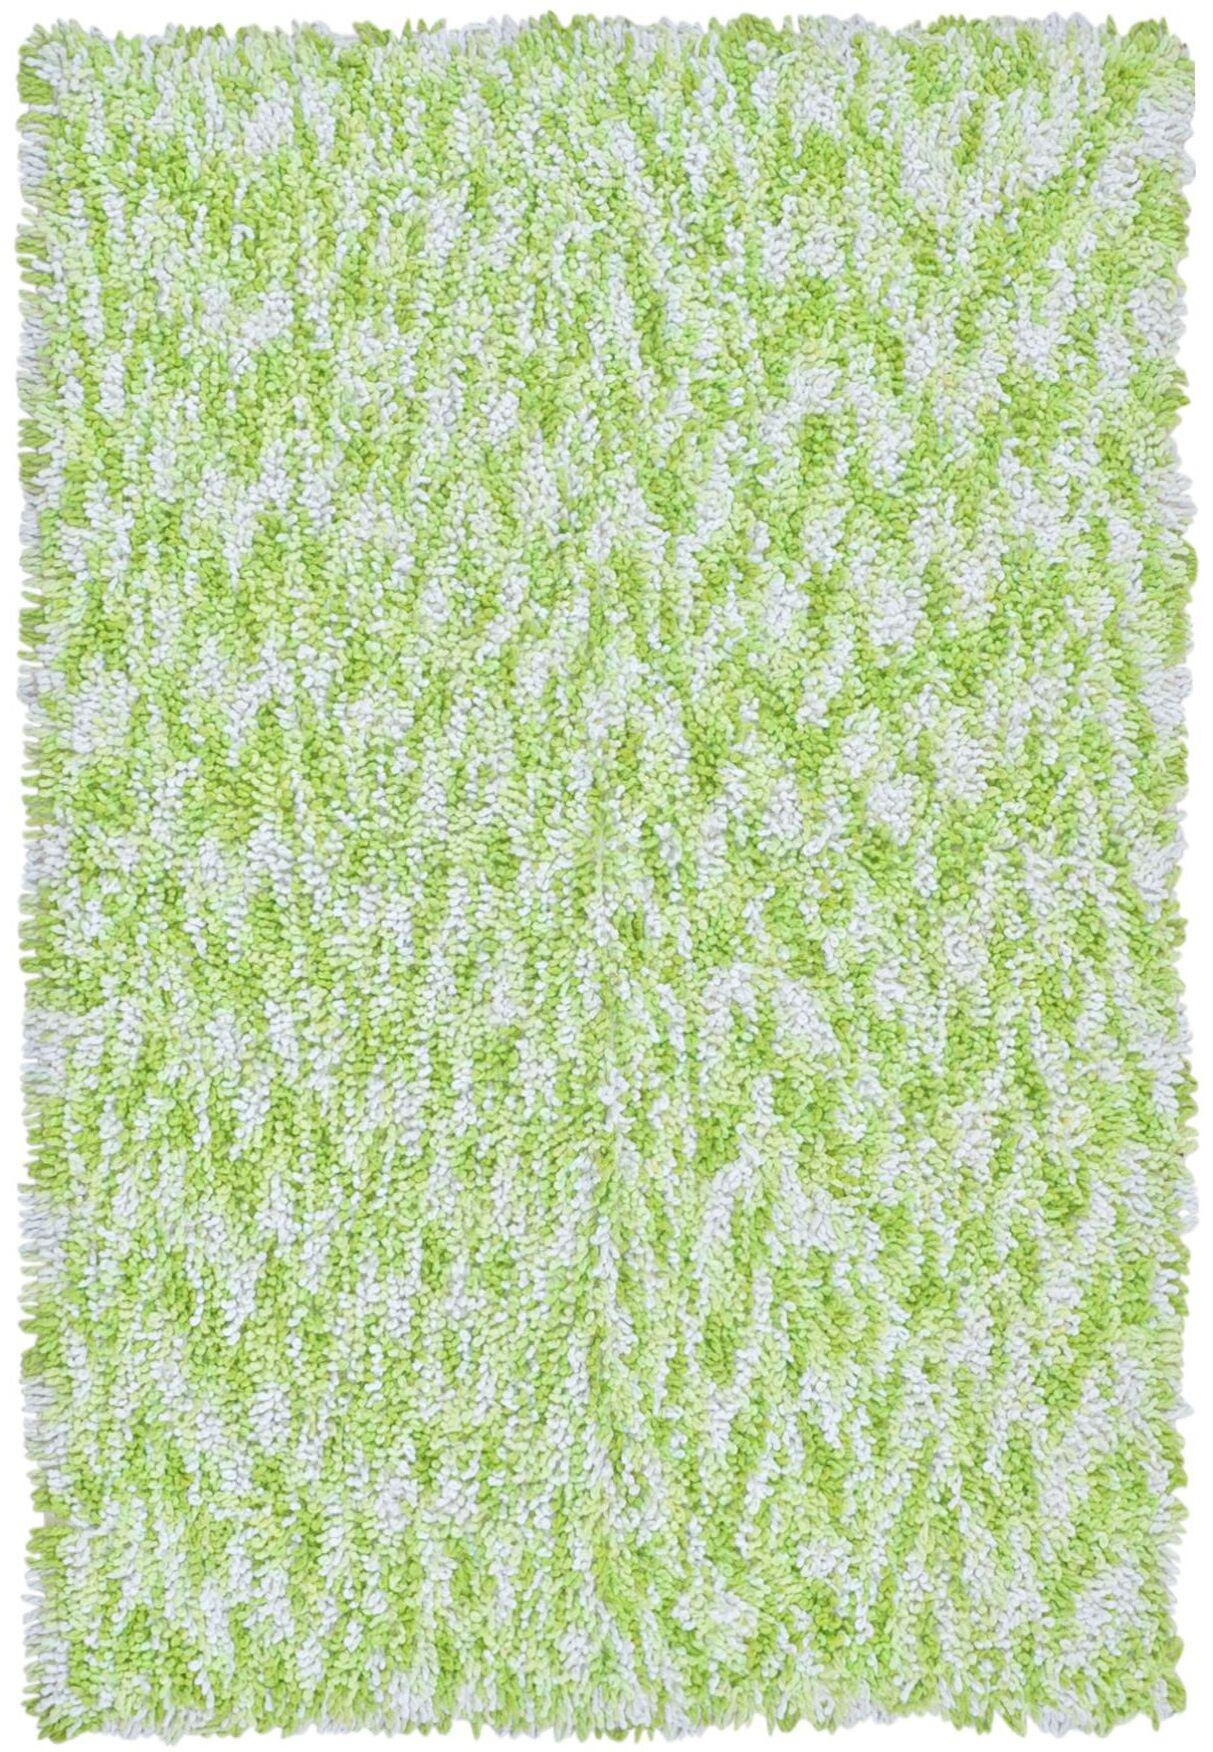 Shagadelic Green Twist Swirl Rug Rug Size: Rectangle 4' x 6'